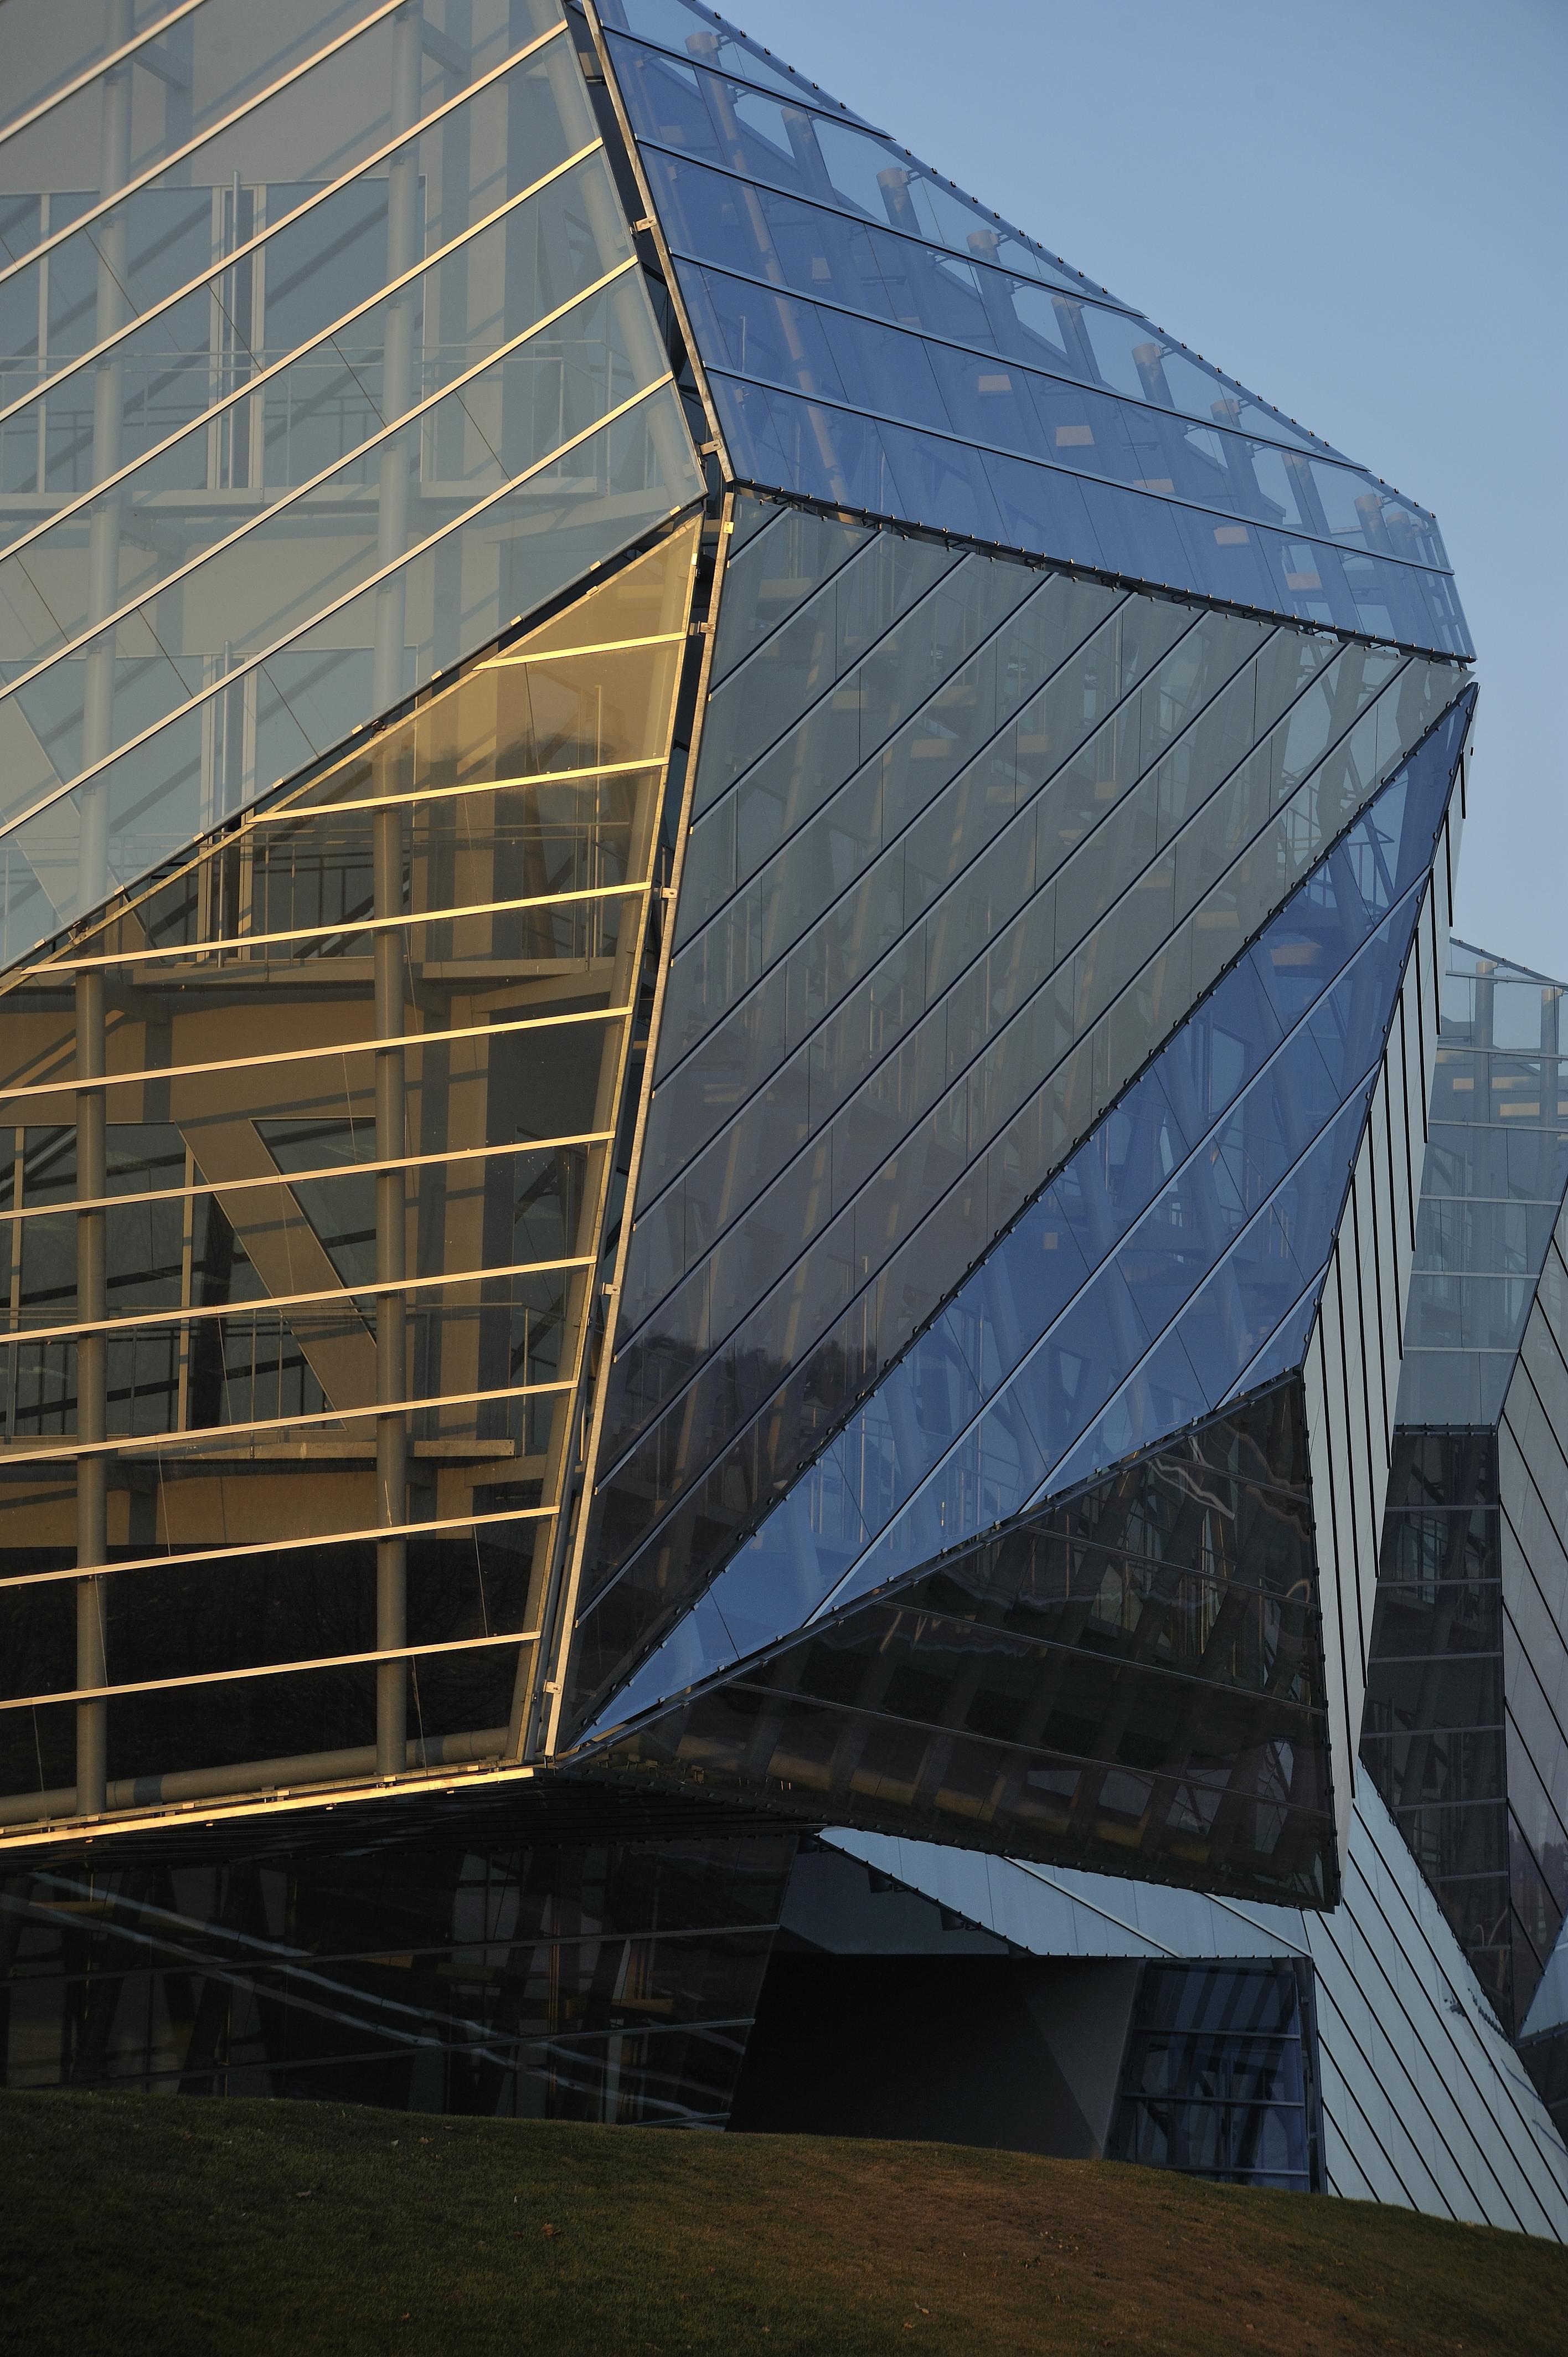 edificio_minano3.jpg